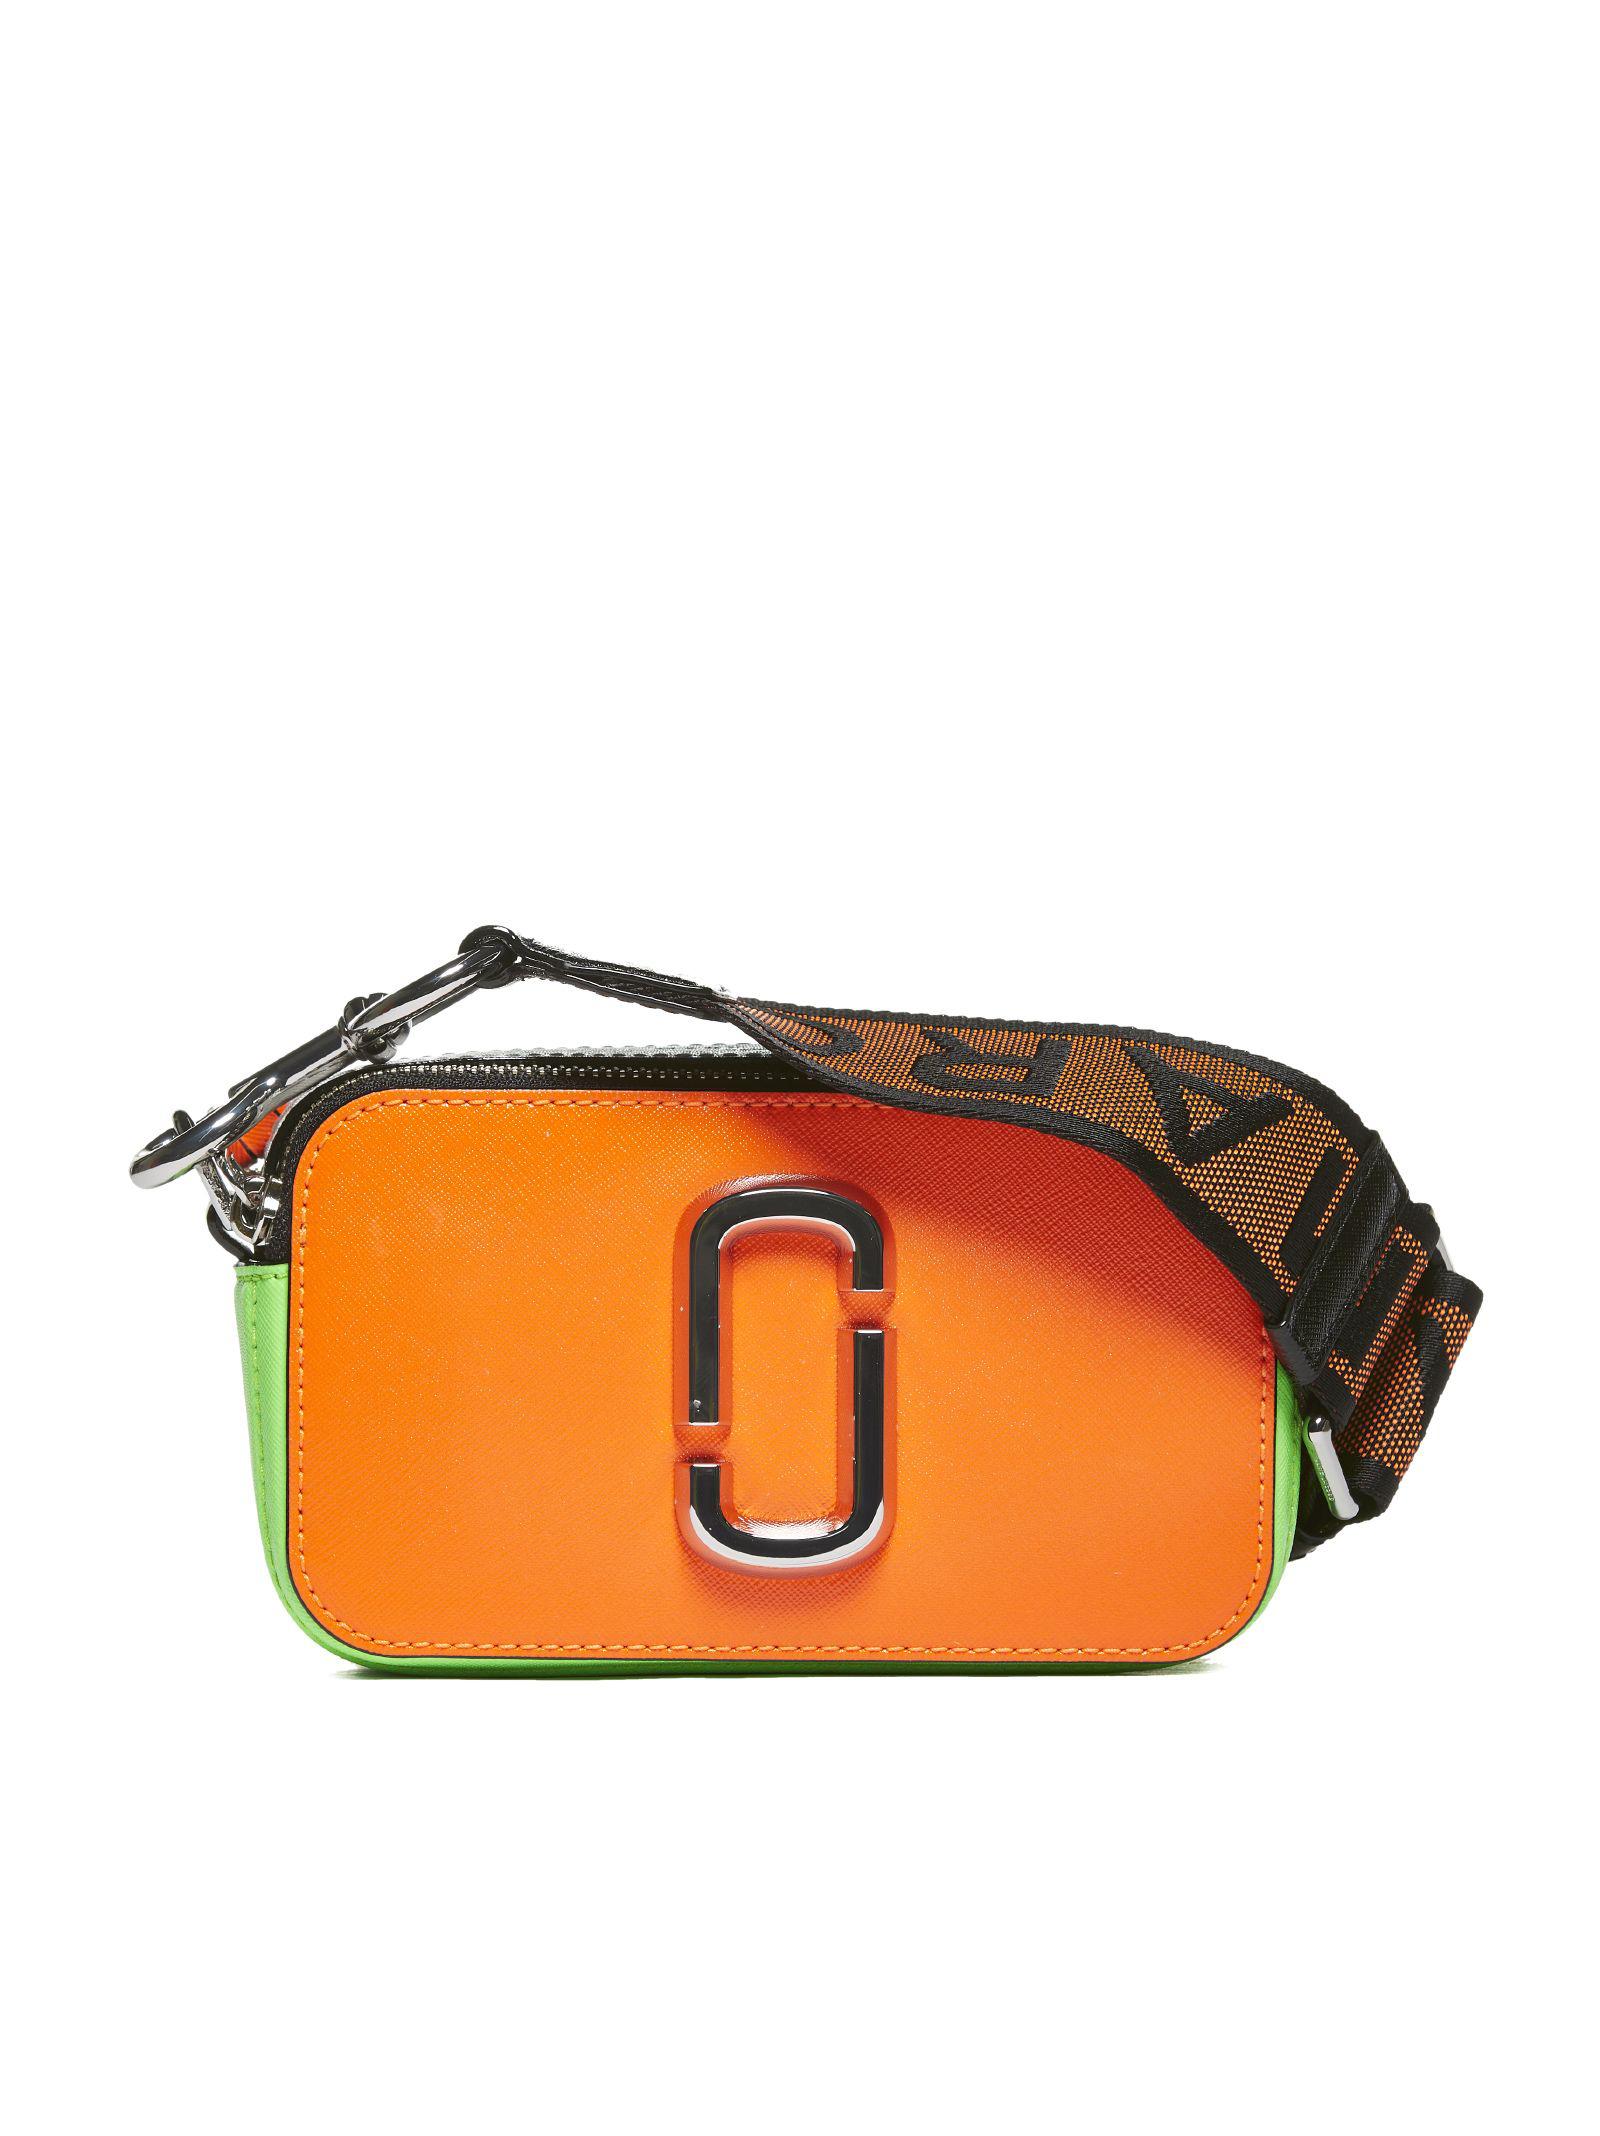 5596b2c0f22 Marc Jacobs Snapshot Camera Shoulder Bag In Arancio Verde | ModeSens